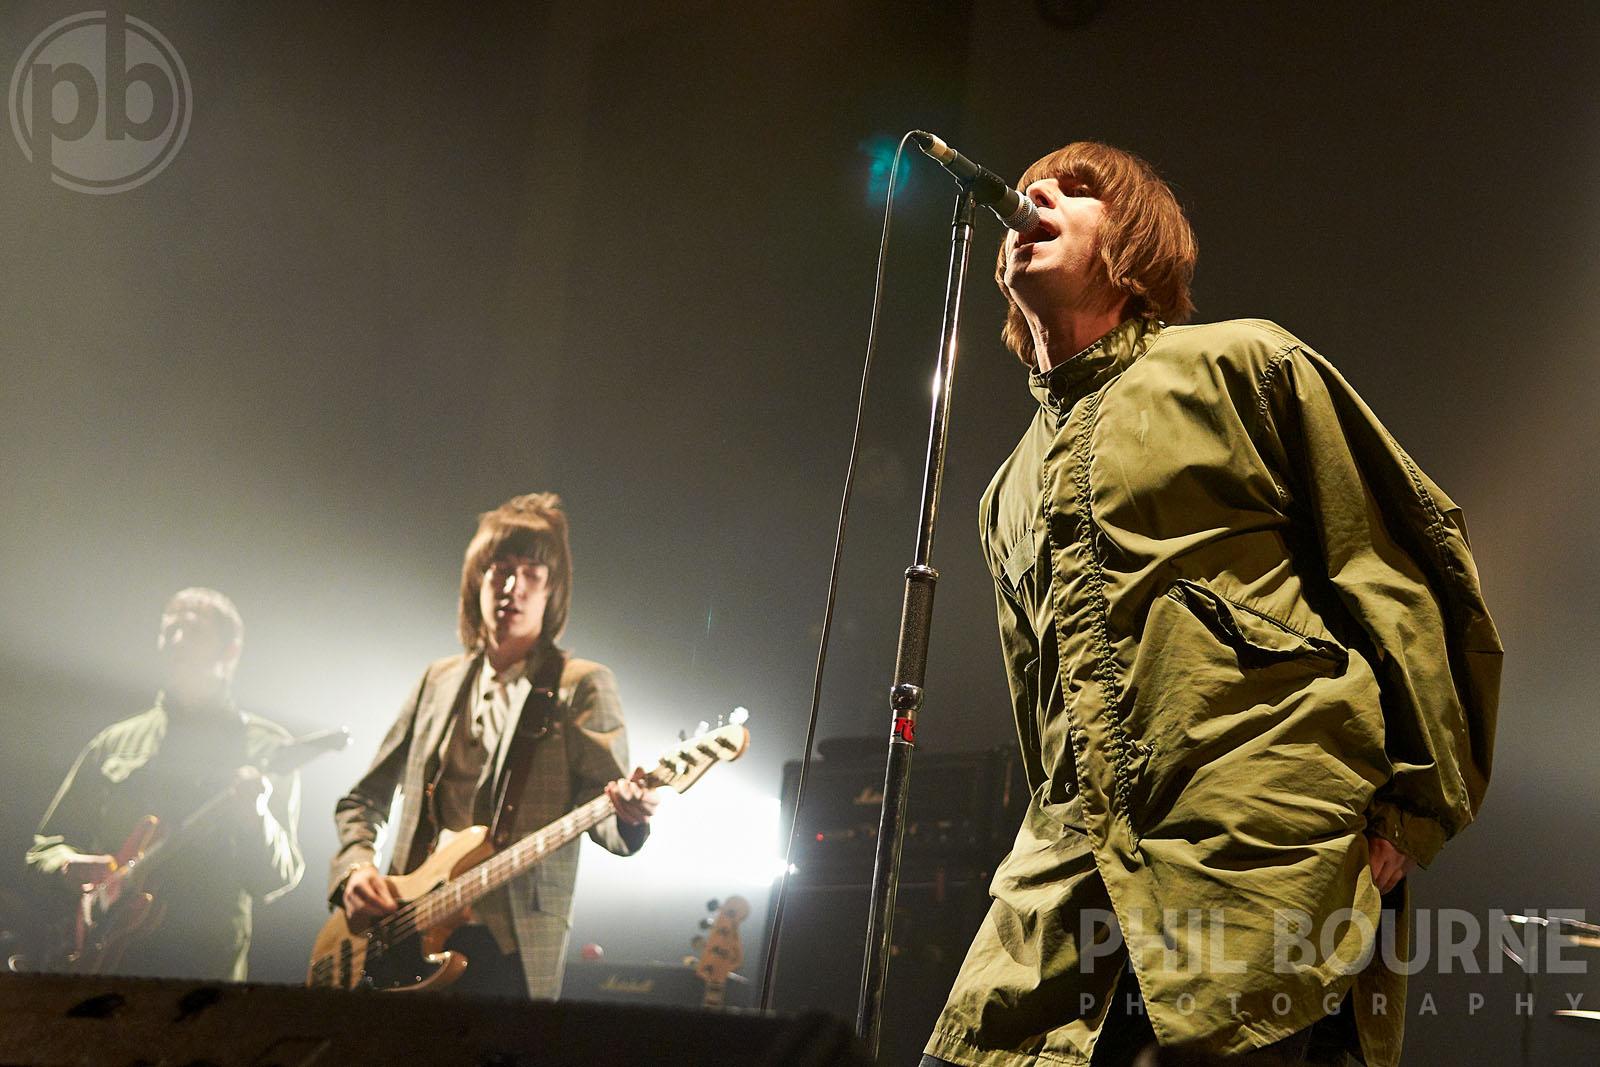 042_Live_Music_Photographer_London_Beady_Eye_Liam_Gallagher_001.jpg